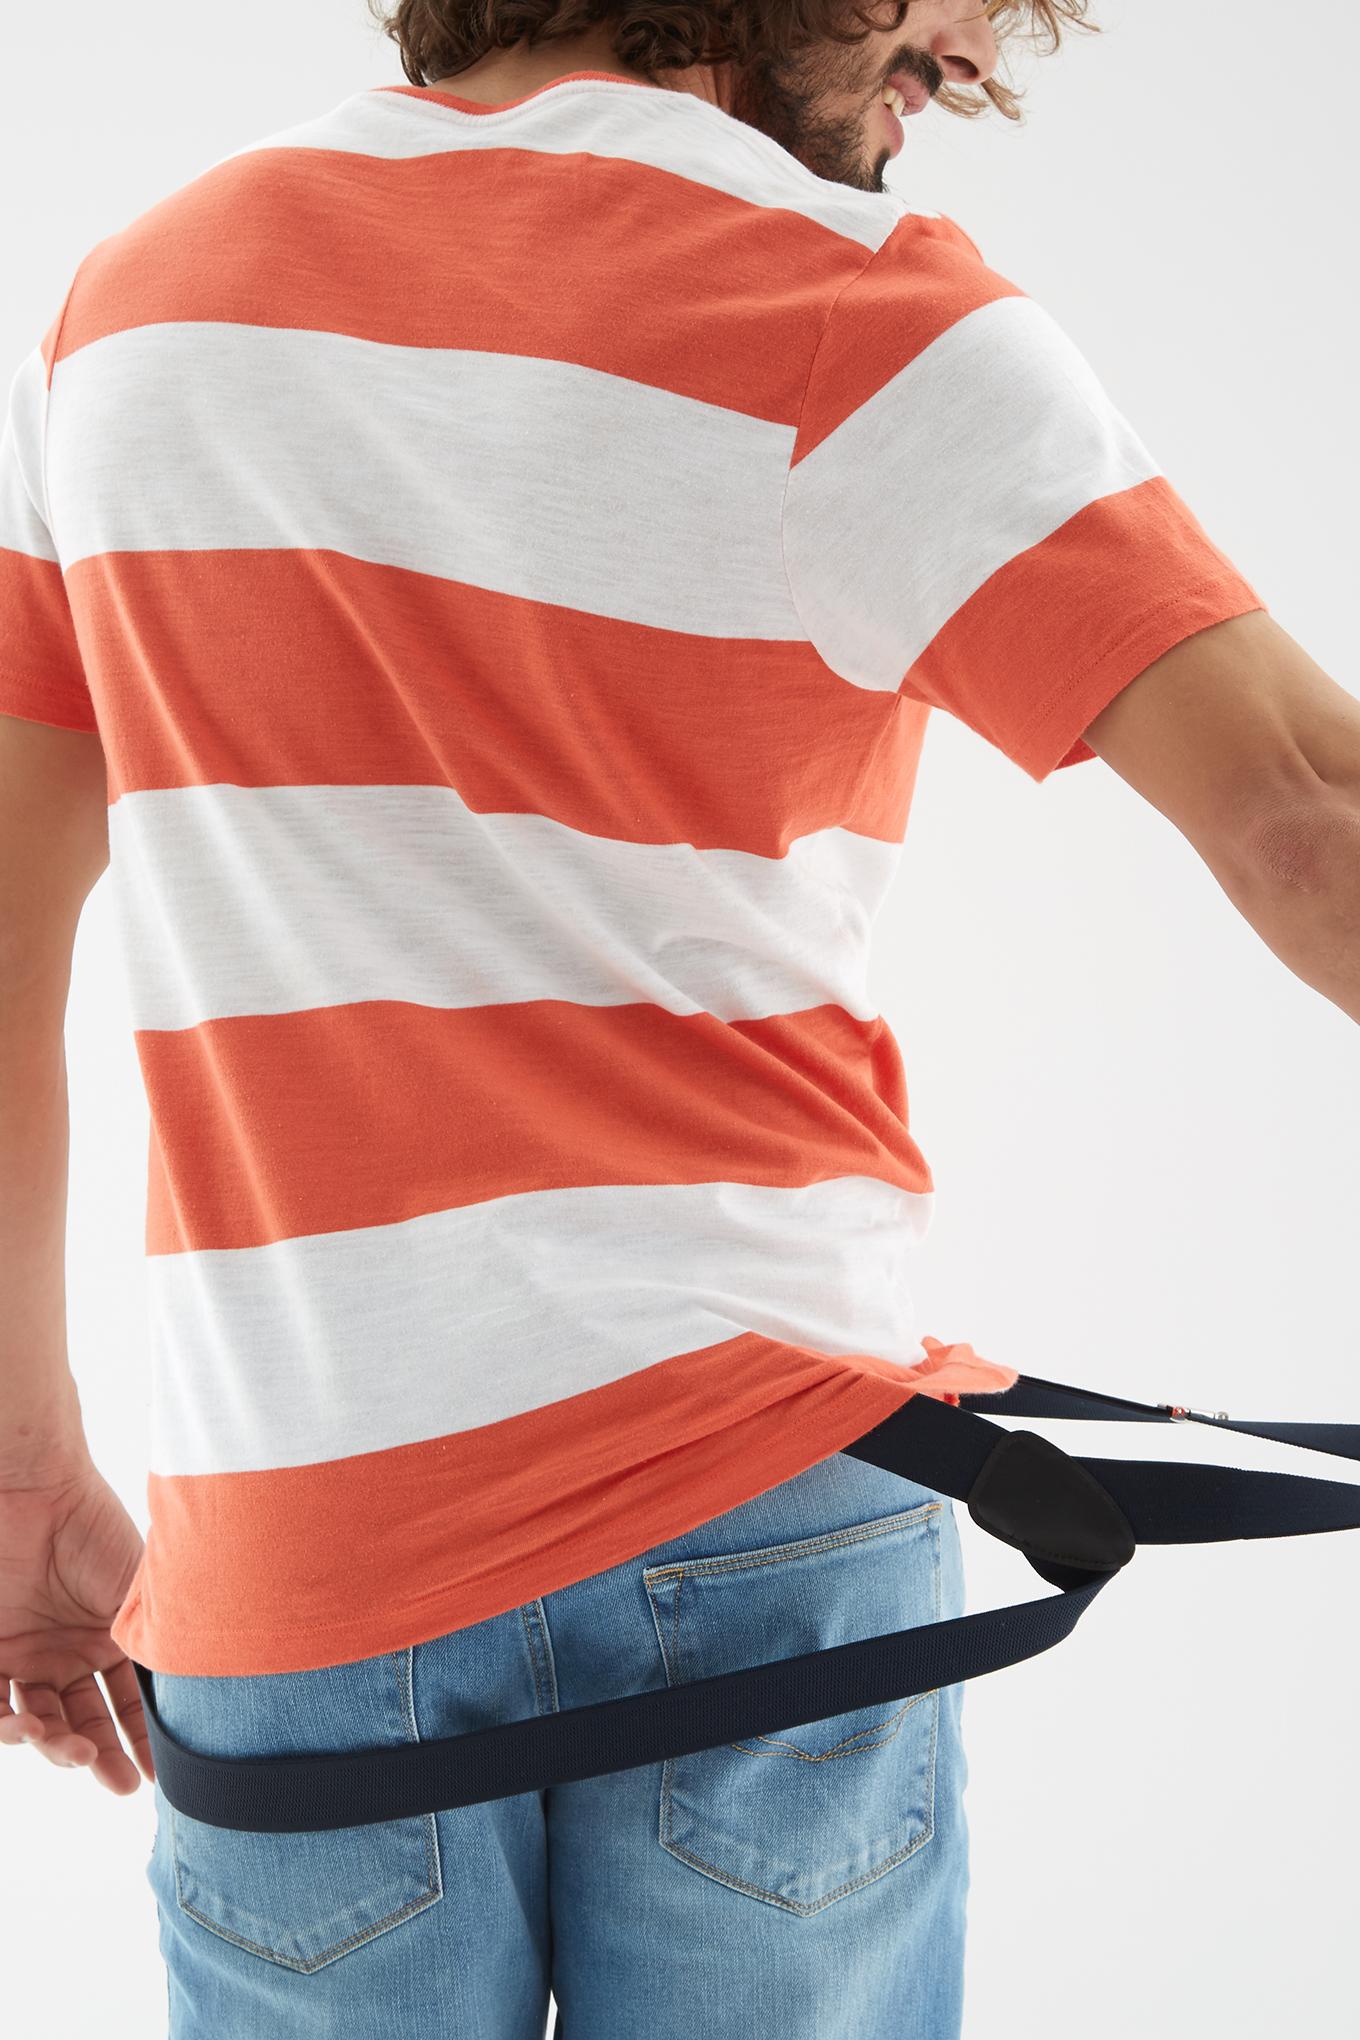 T-Shirt Orange Sport Man